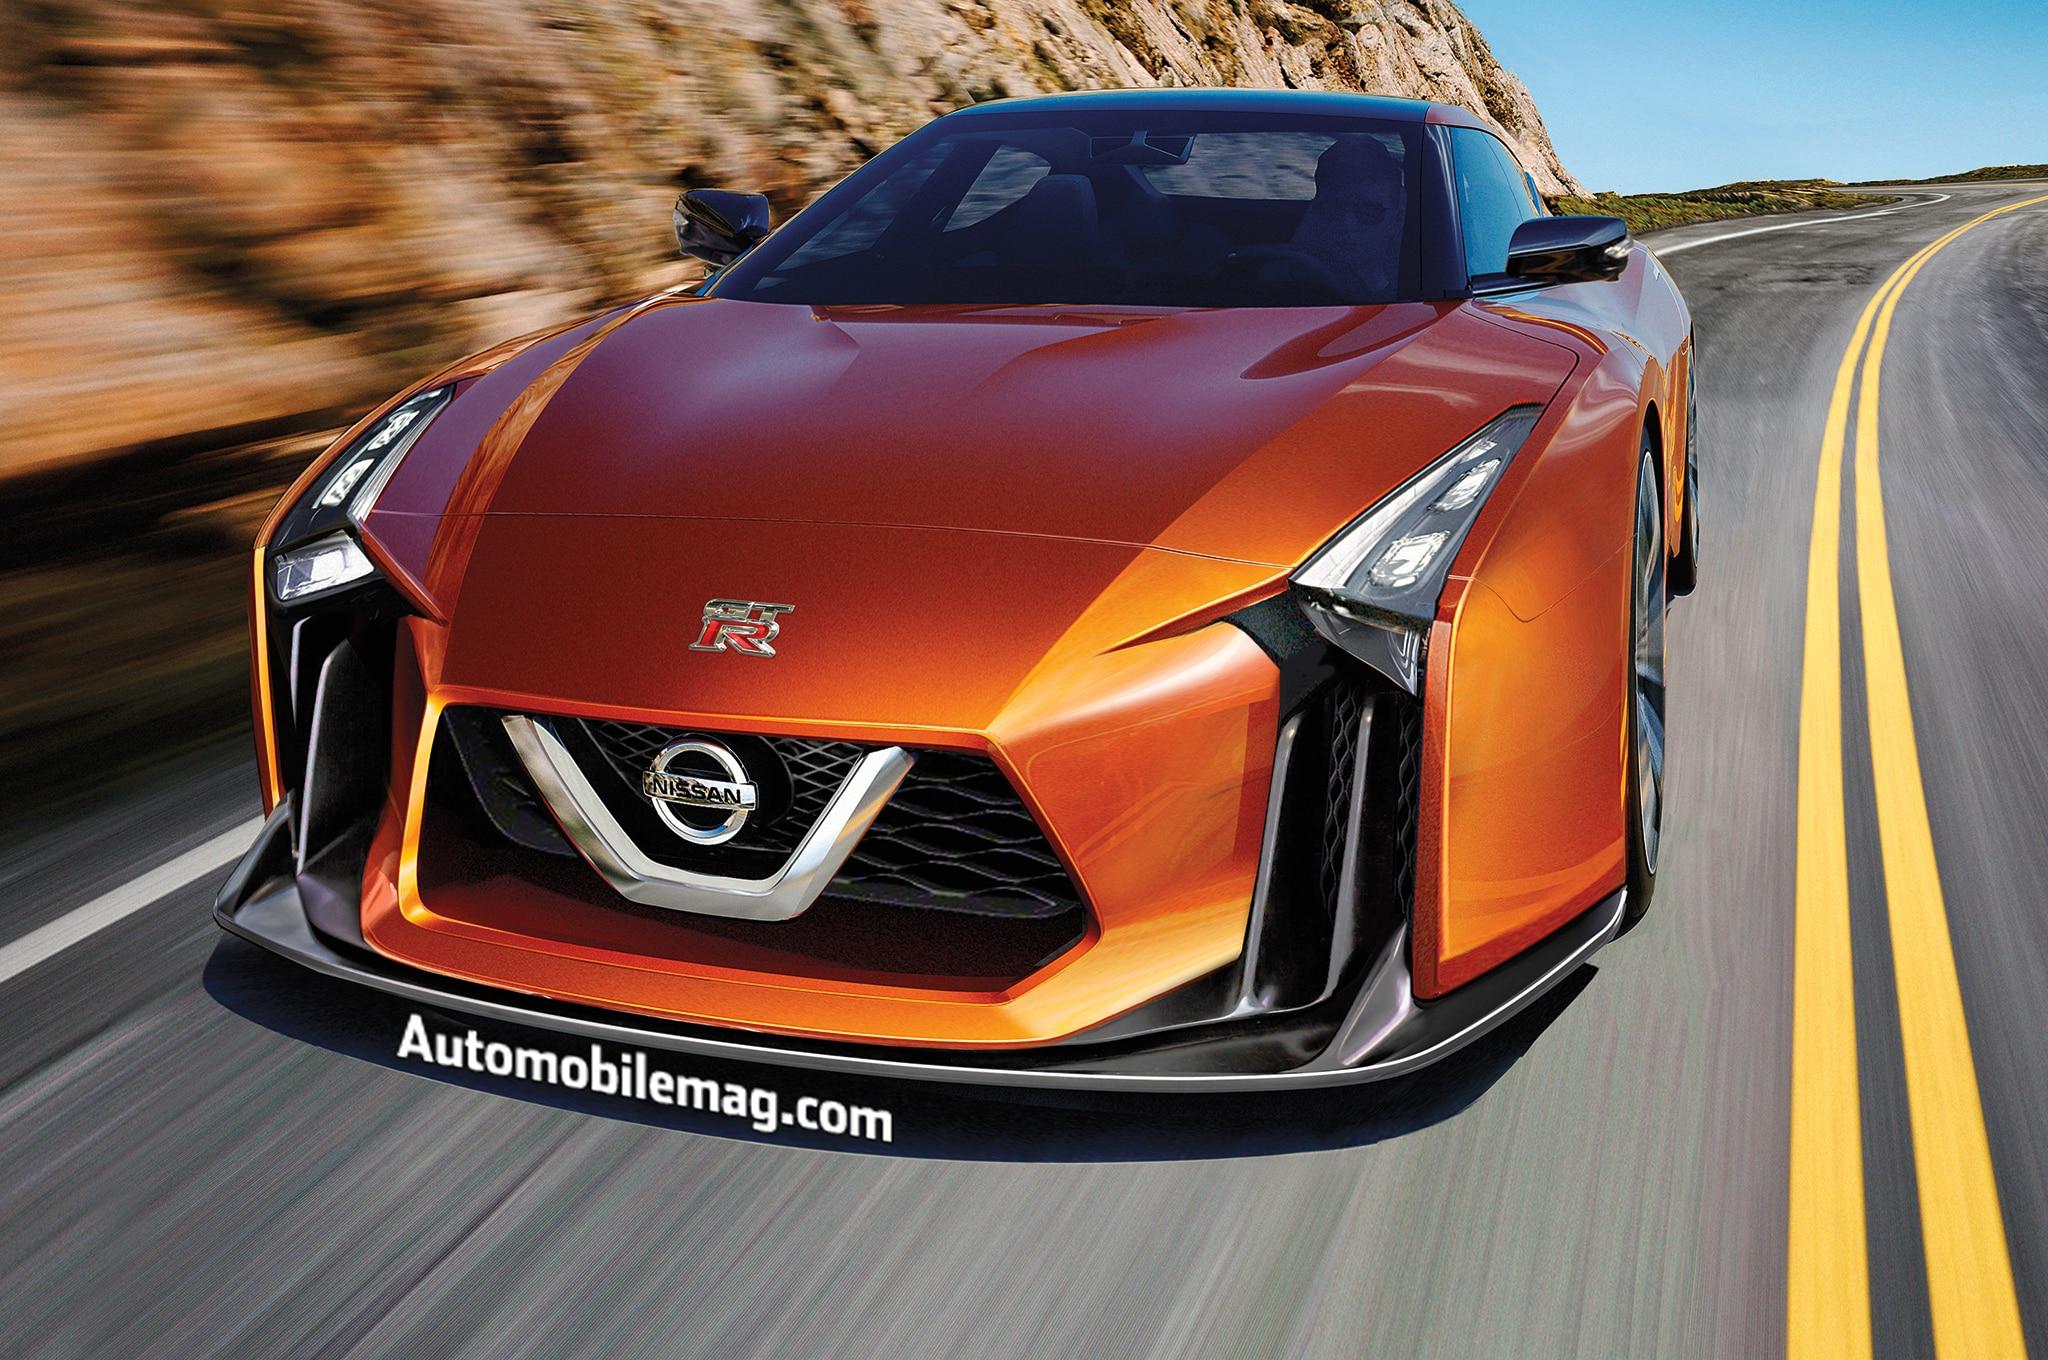 Lexus Sports Car >> Future Japanese Sports Cars: Nissan GT-R, Lexus SC, and Toyota Supra